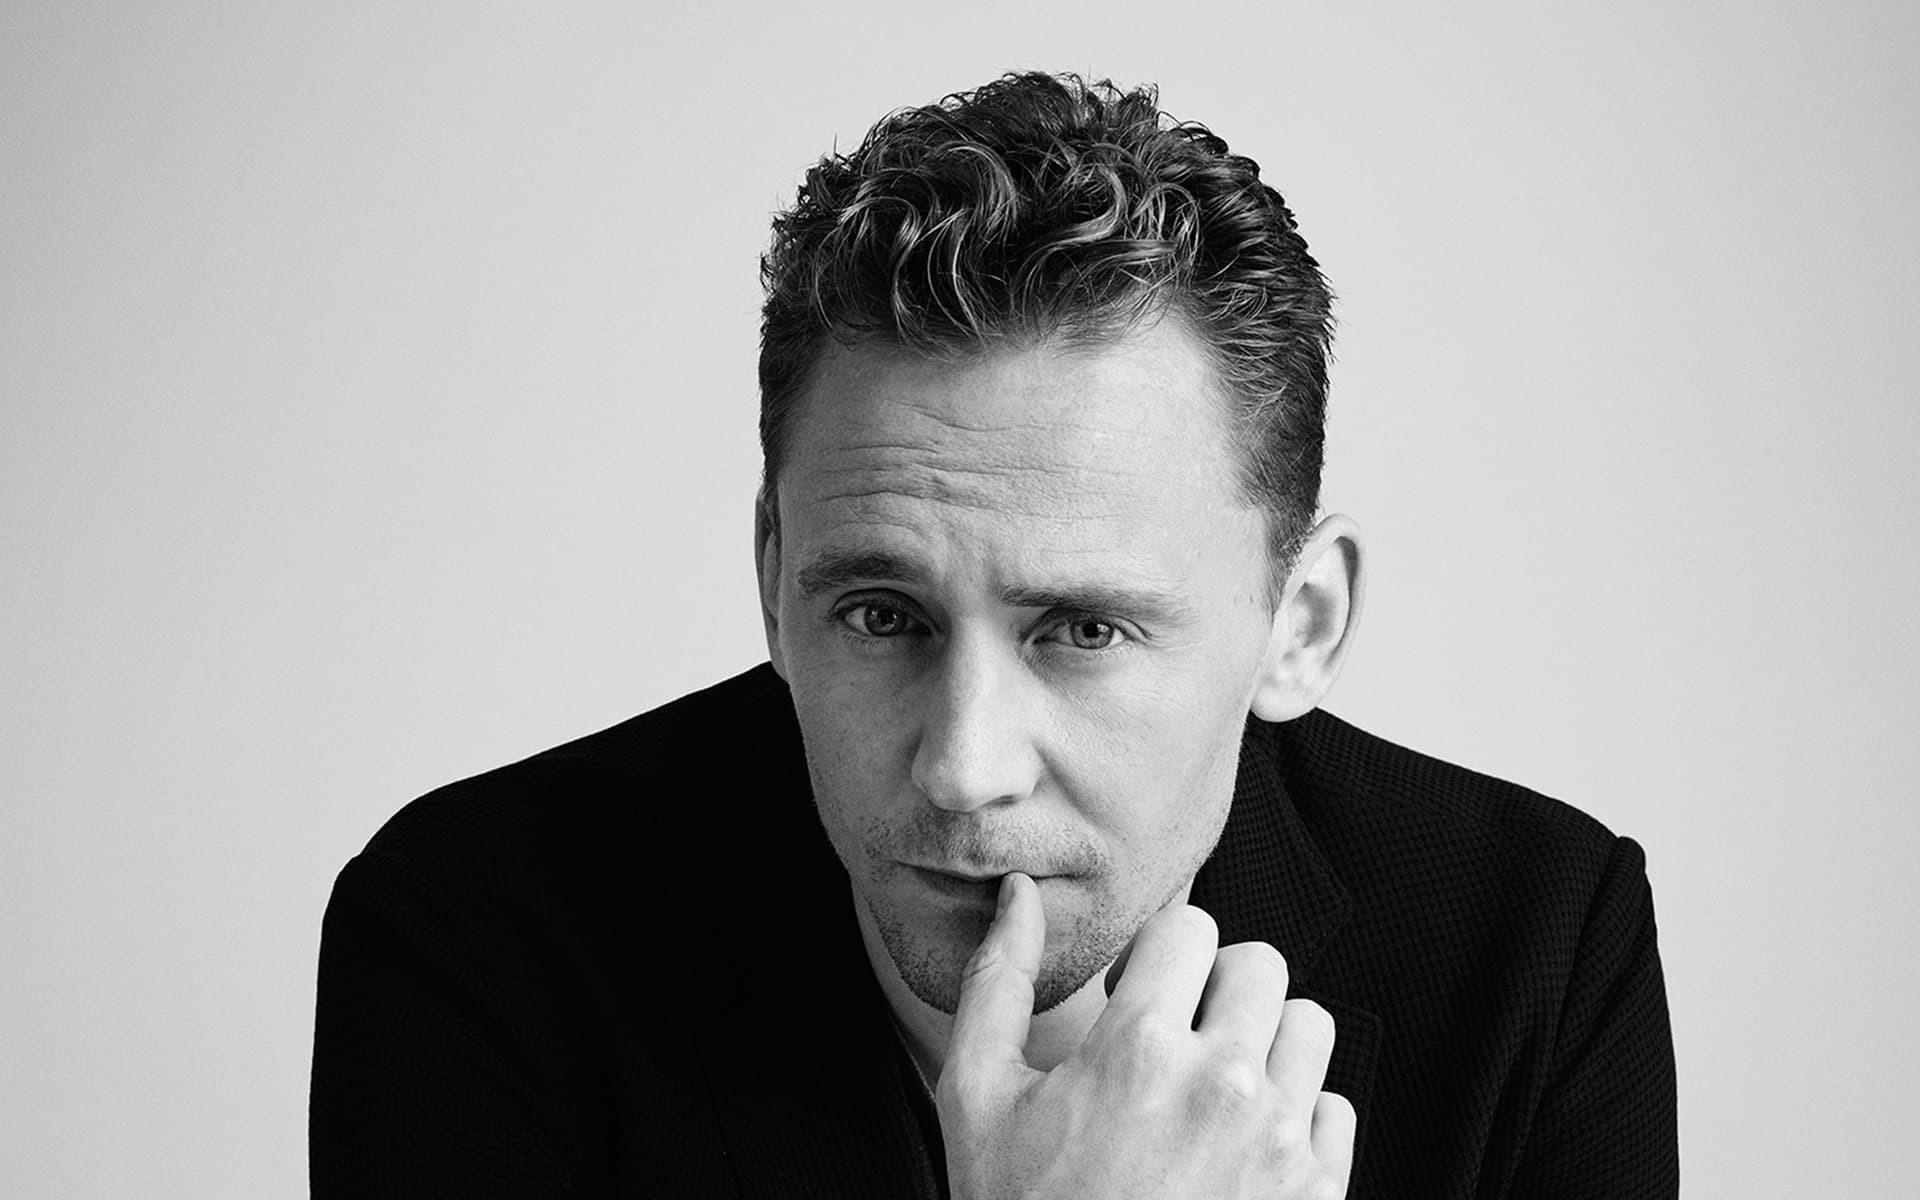 Monochrome Tom Hiddleston Wallpaper 55660 px .